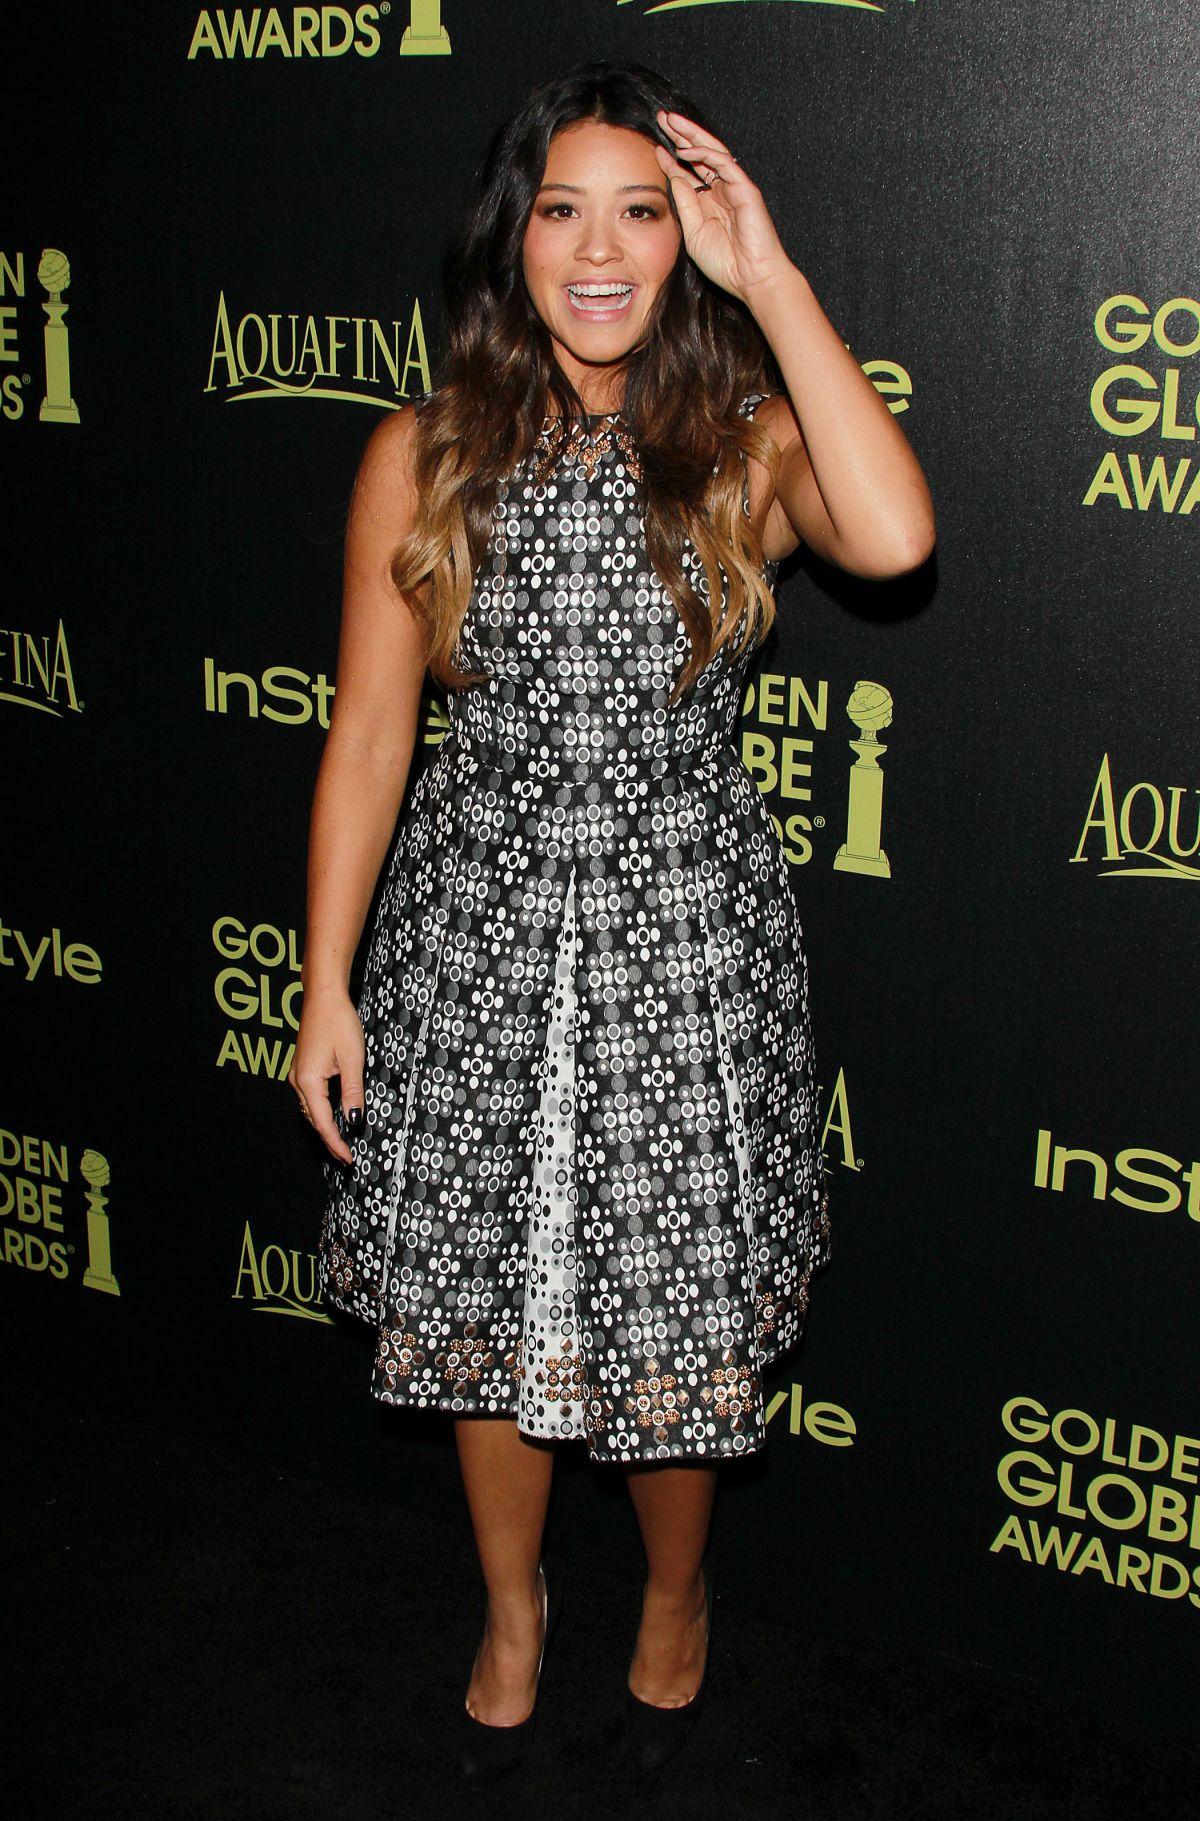 GINA RODRIGUEZ at Hfpa abd Instyle Celebrate 2015 Golden Globe Award Season in Hollywood